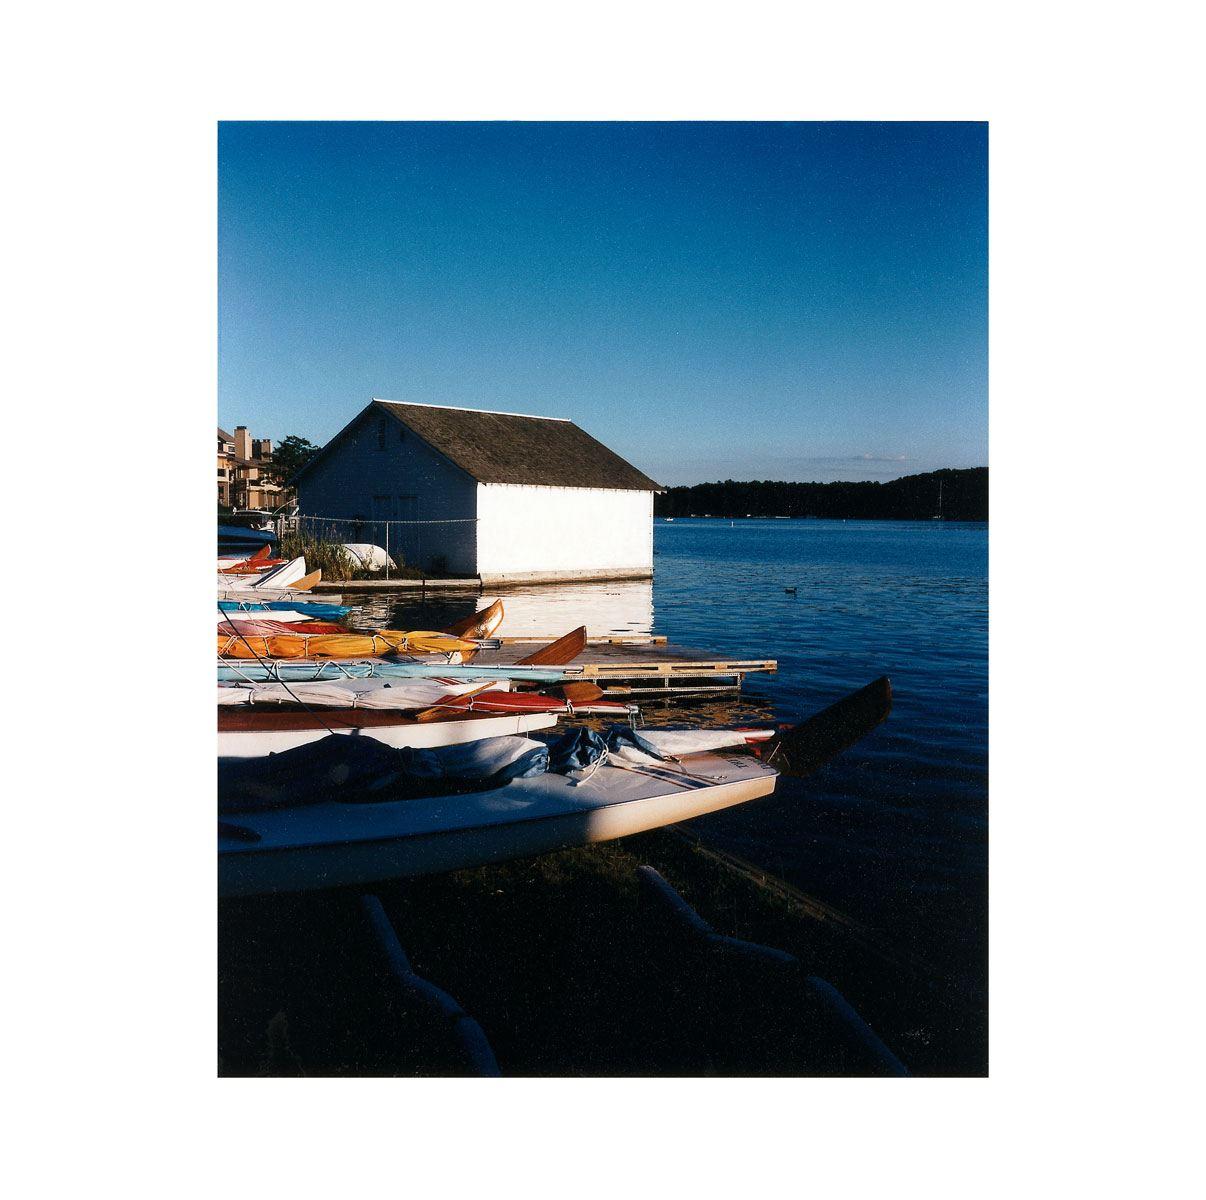 """Boats"" | Village Portrait | Pentwater, Michigan, USA | 1996"